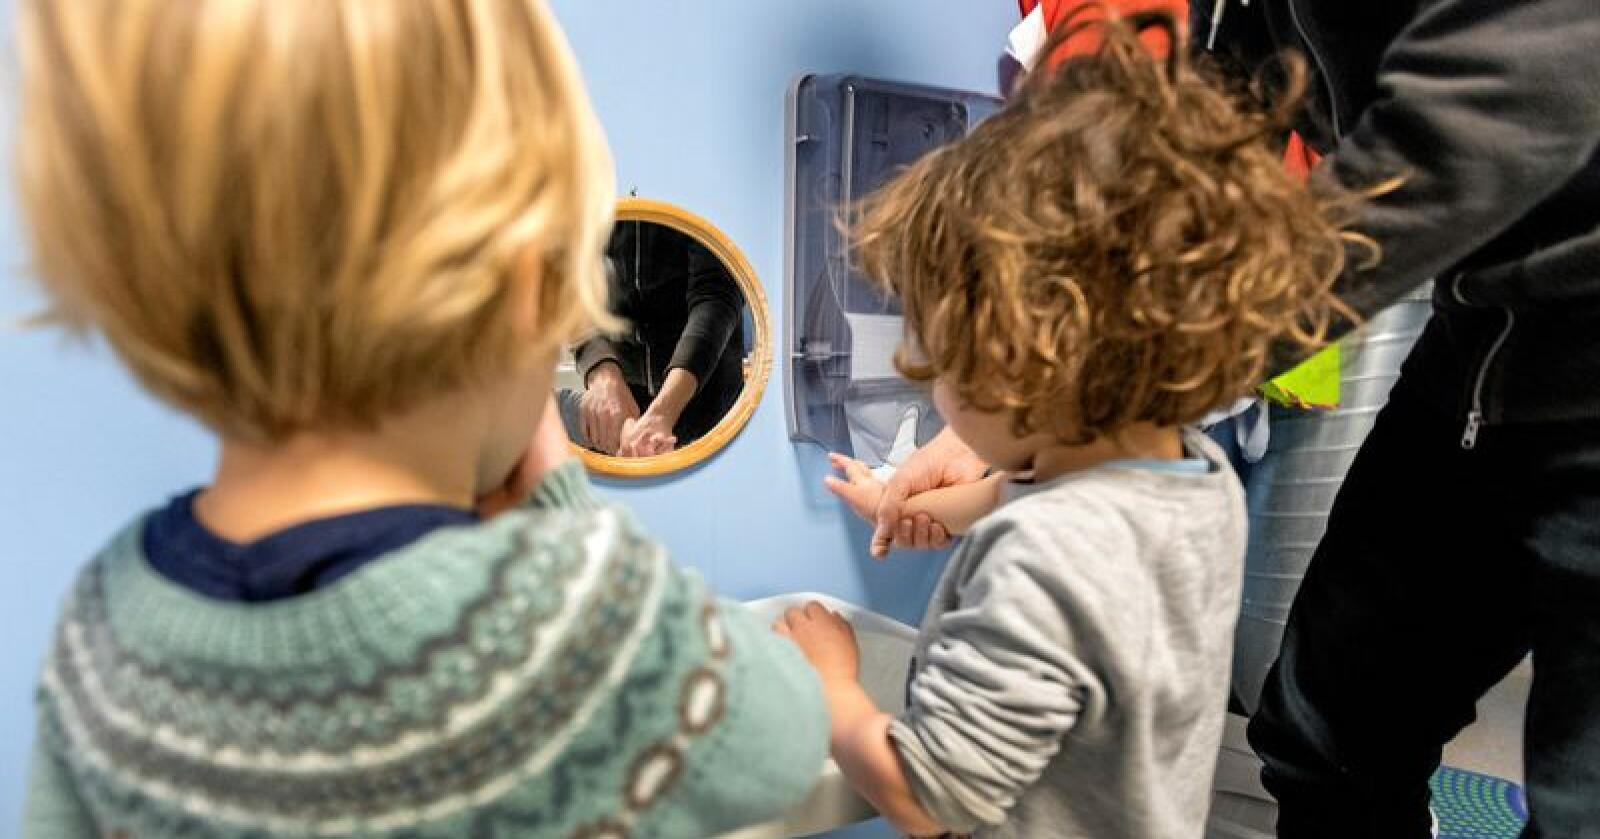 Barnehage: En korrigert oppholdstime i en kommunal barnehage koster kommunen cirka fem kroner mer enn en korrigert oppholdstime i en privat barnehage. Foto: Gorm Kallestad / NTB scanpix